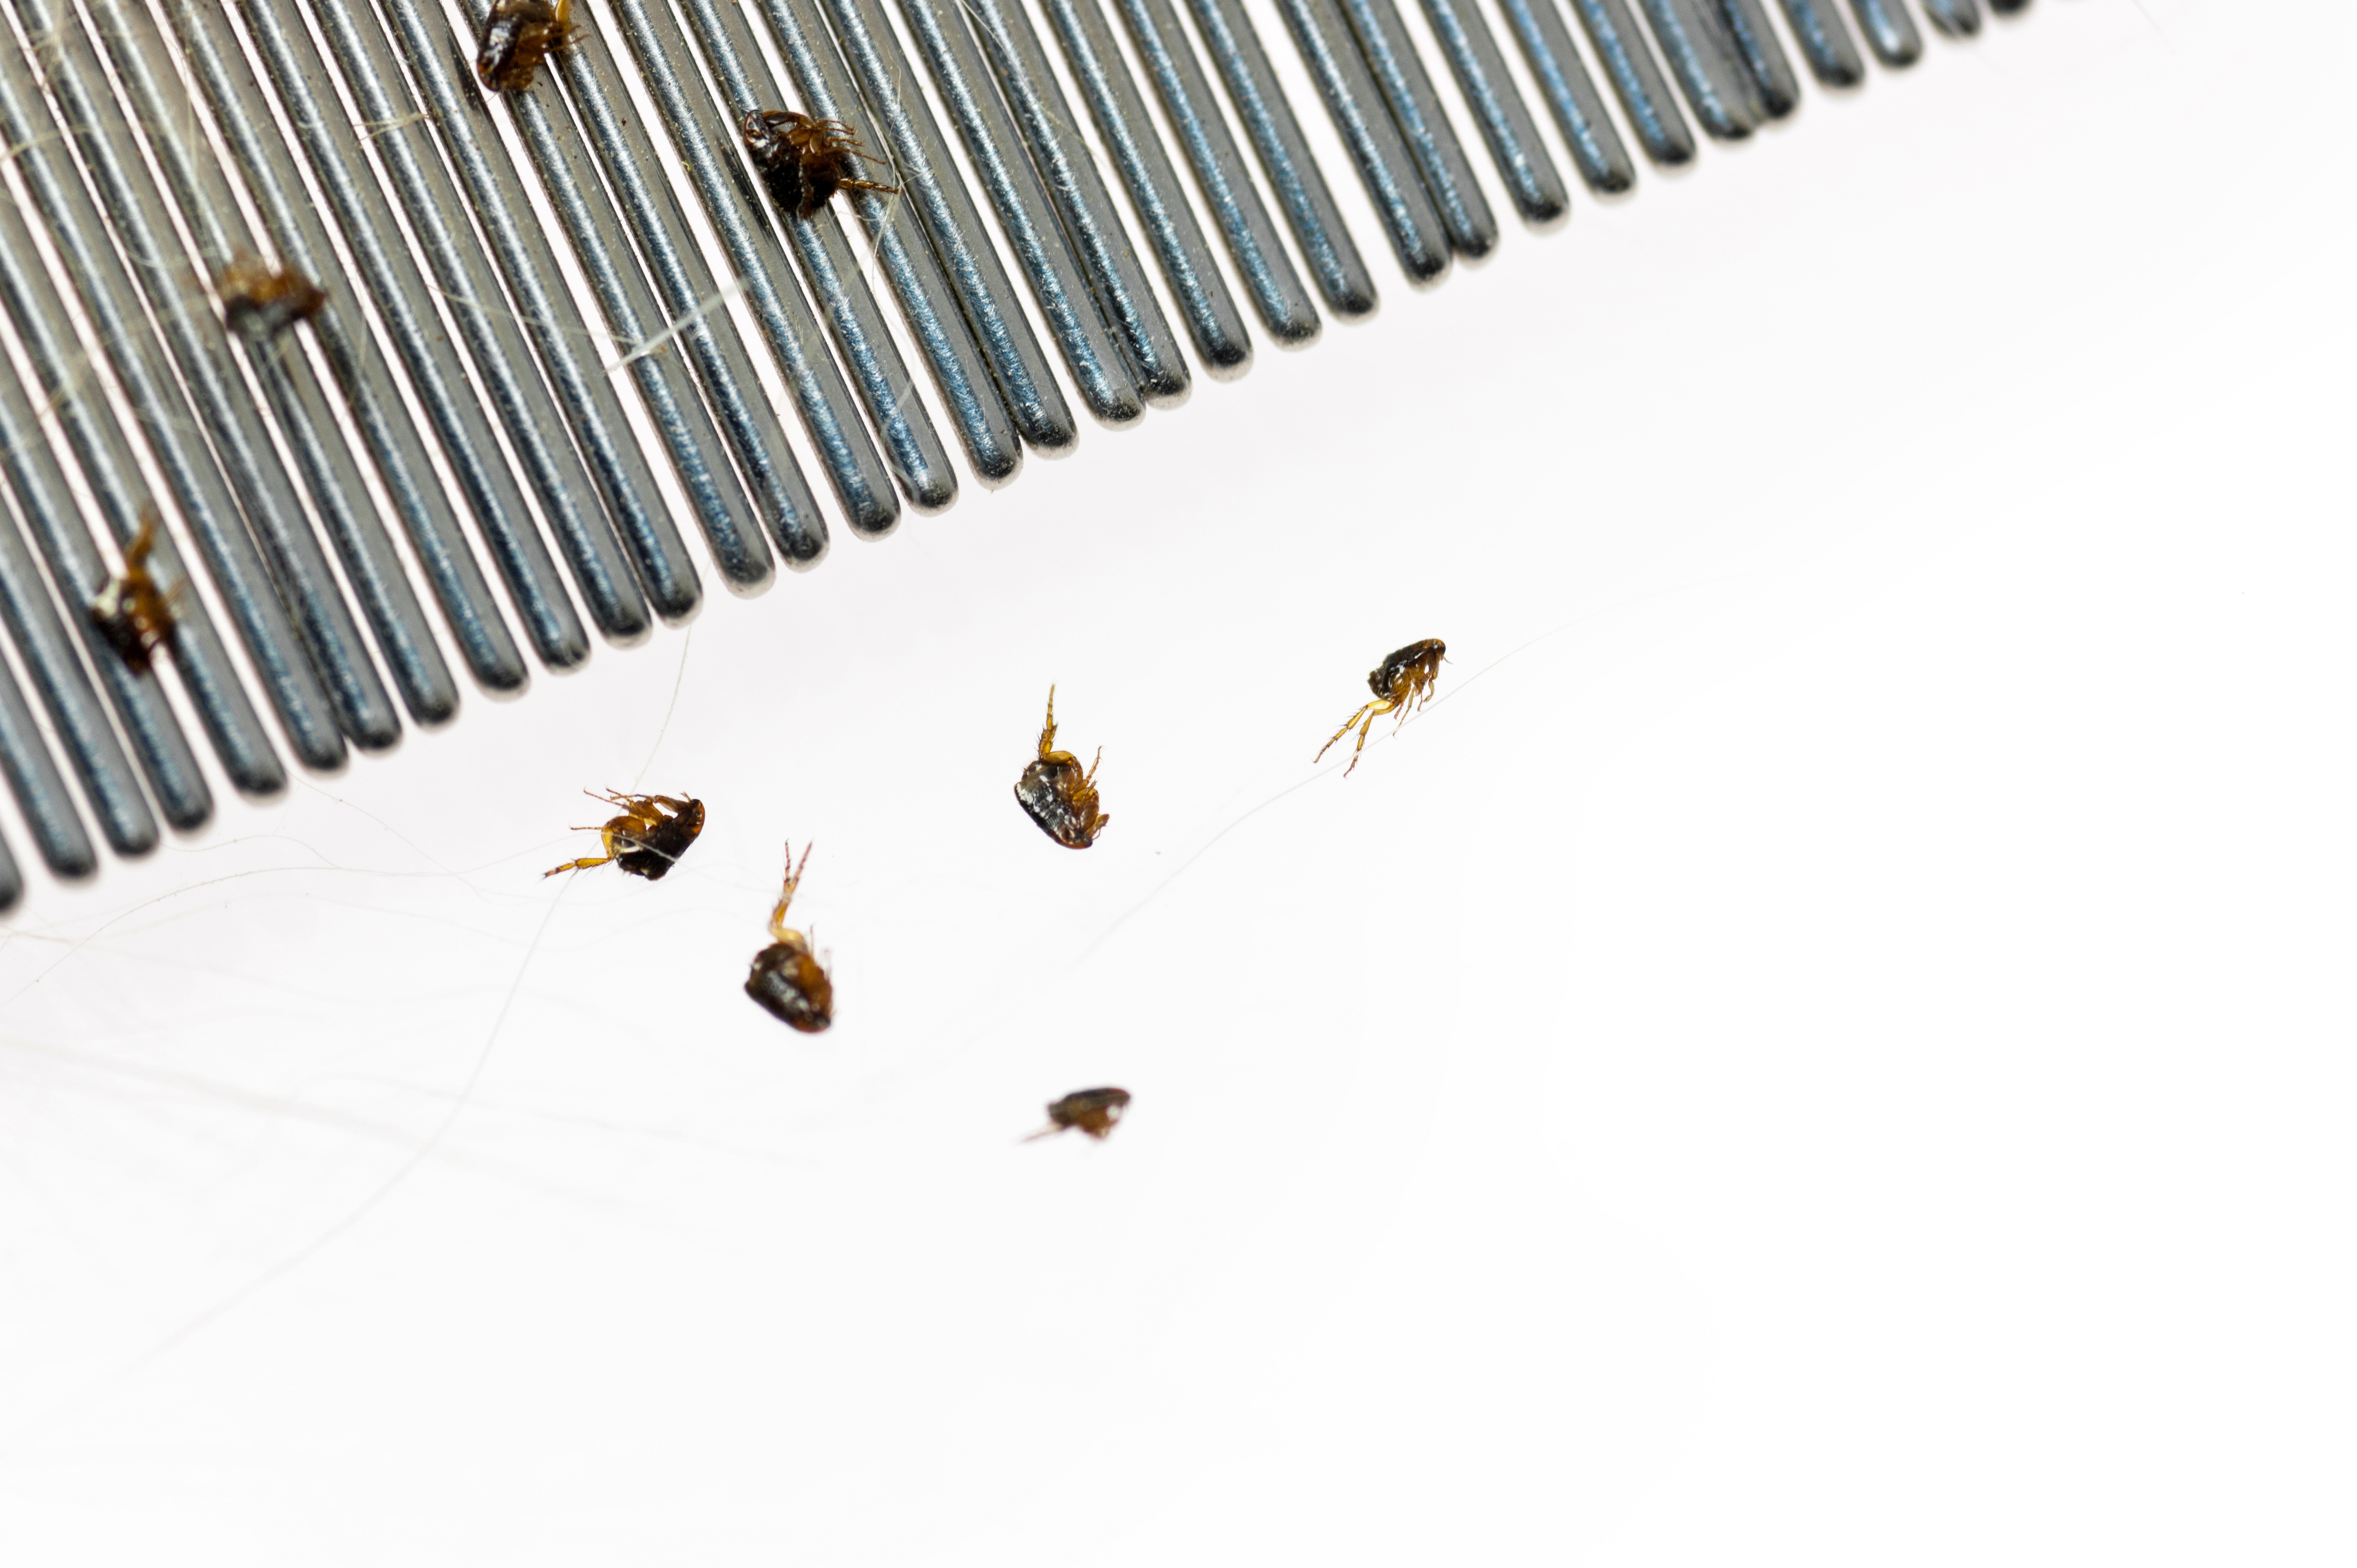 Fleas Image 02